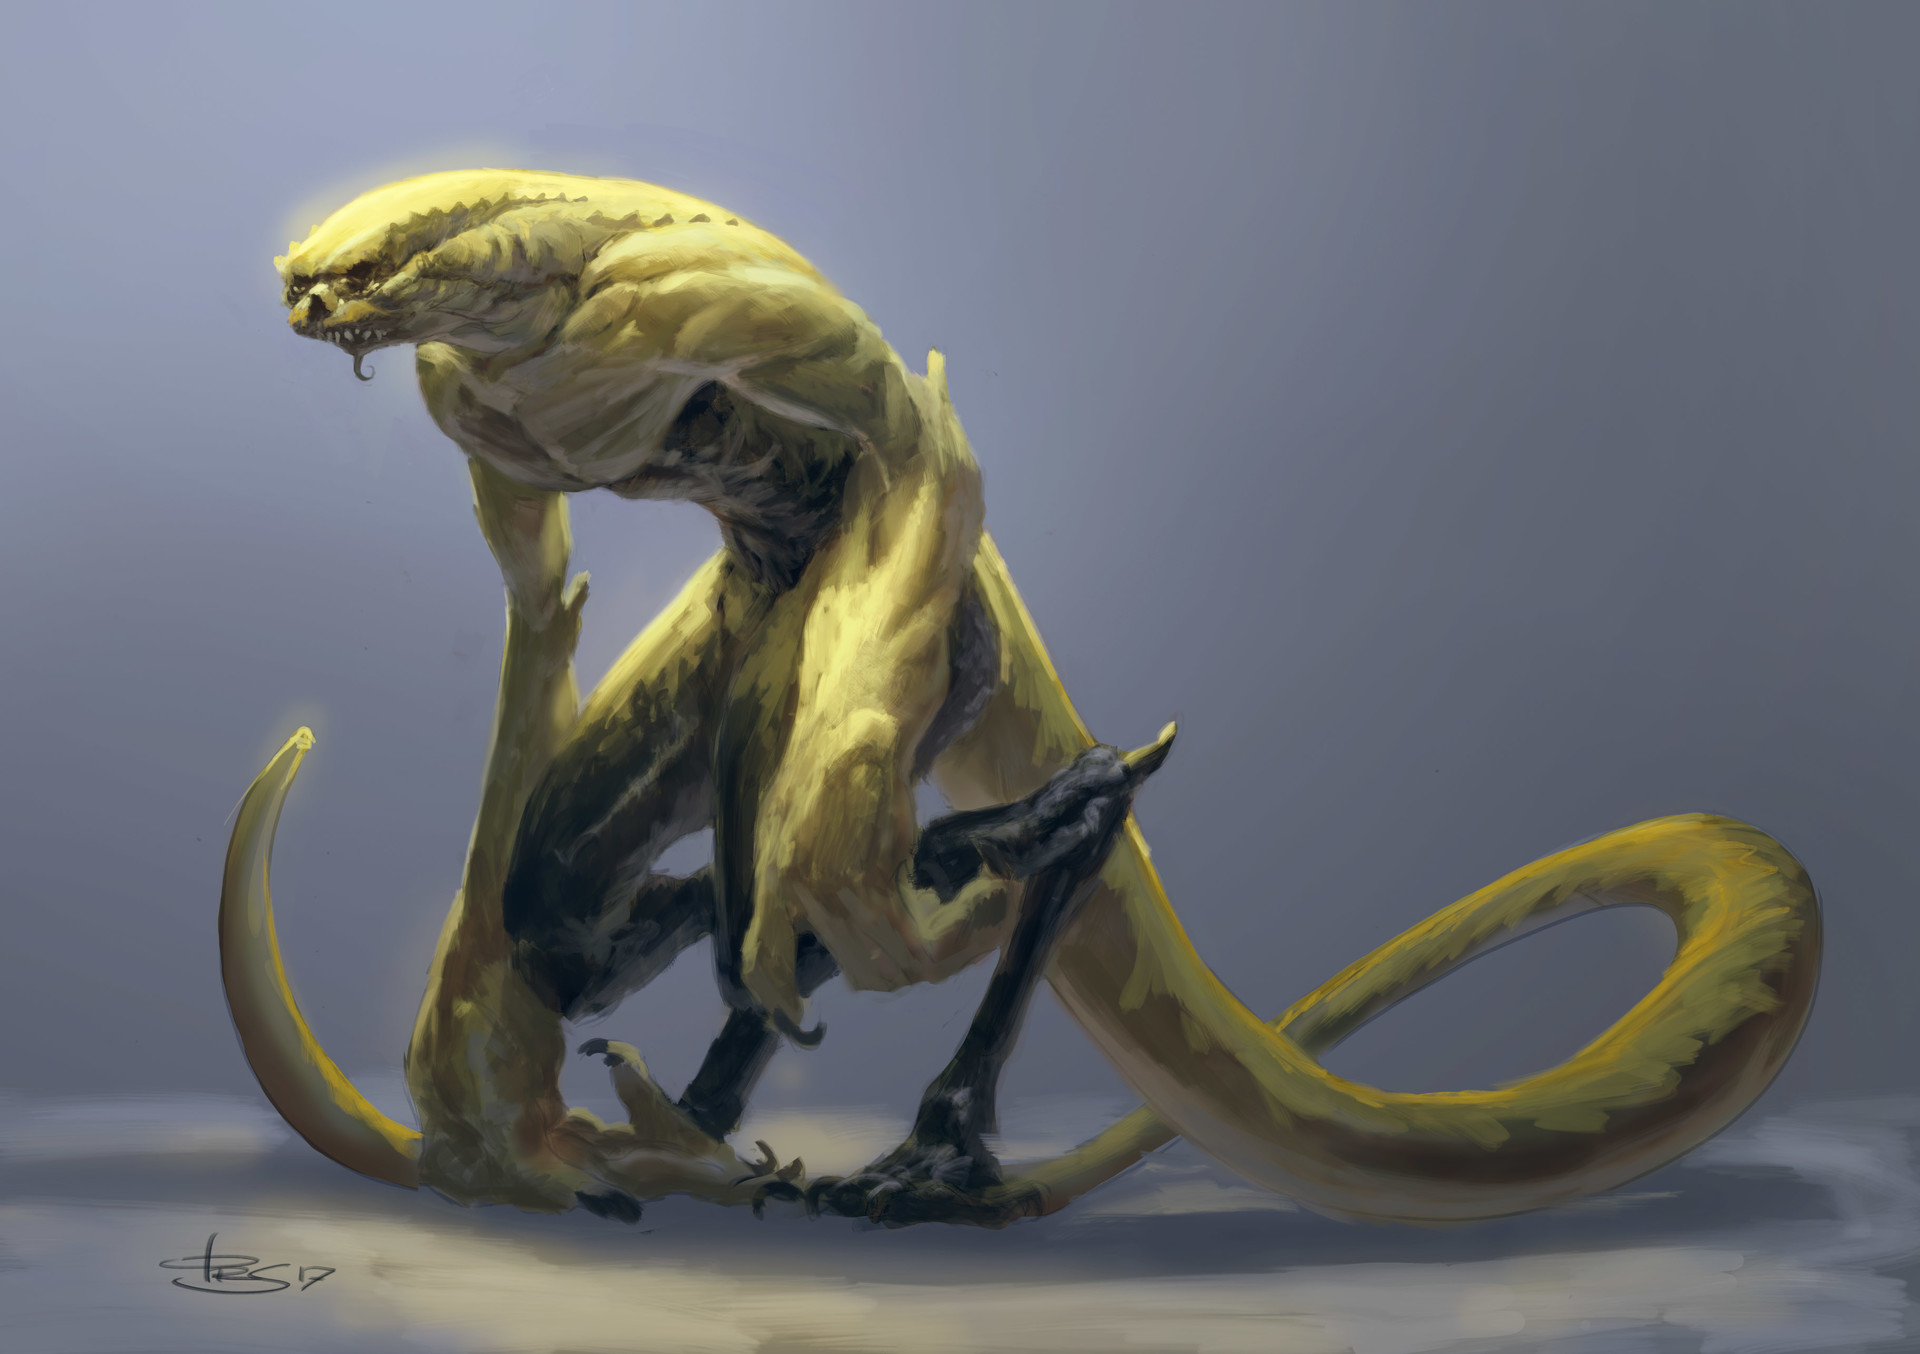 Lizard man dude